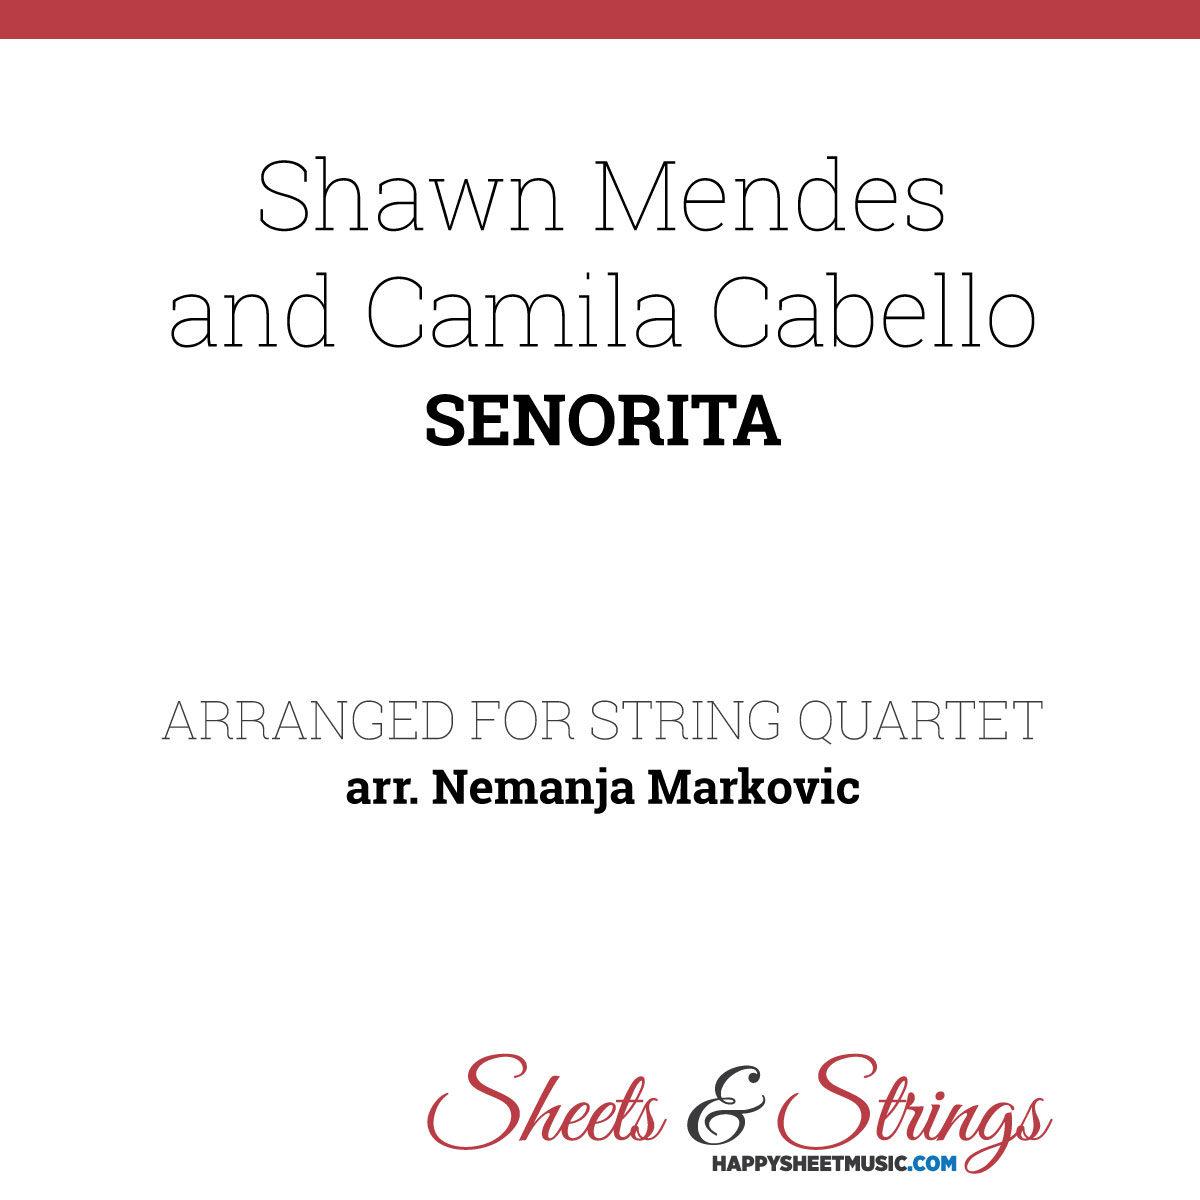 Shawn Mendes and Camila Cabello - Senorita - Sheet Music for String Quartet - Music Arrangement for String Quartet